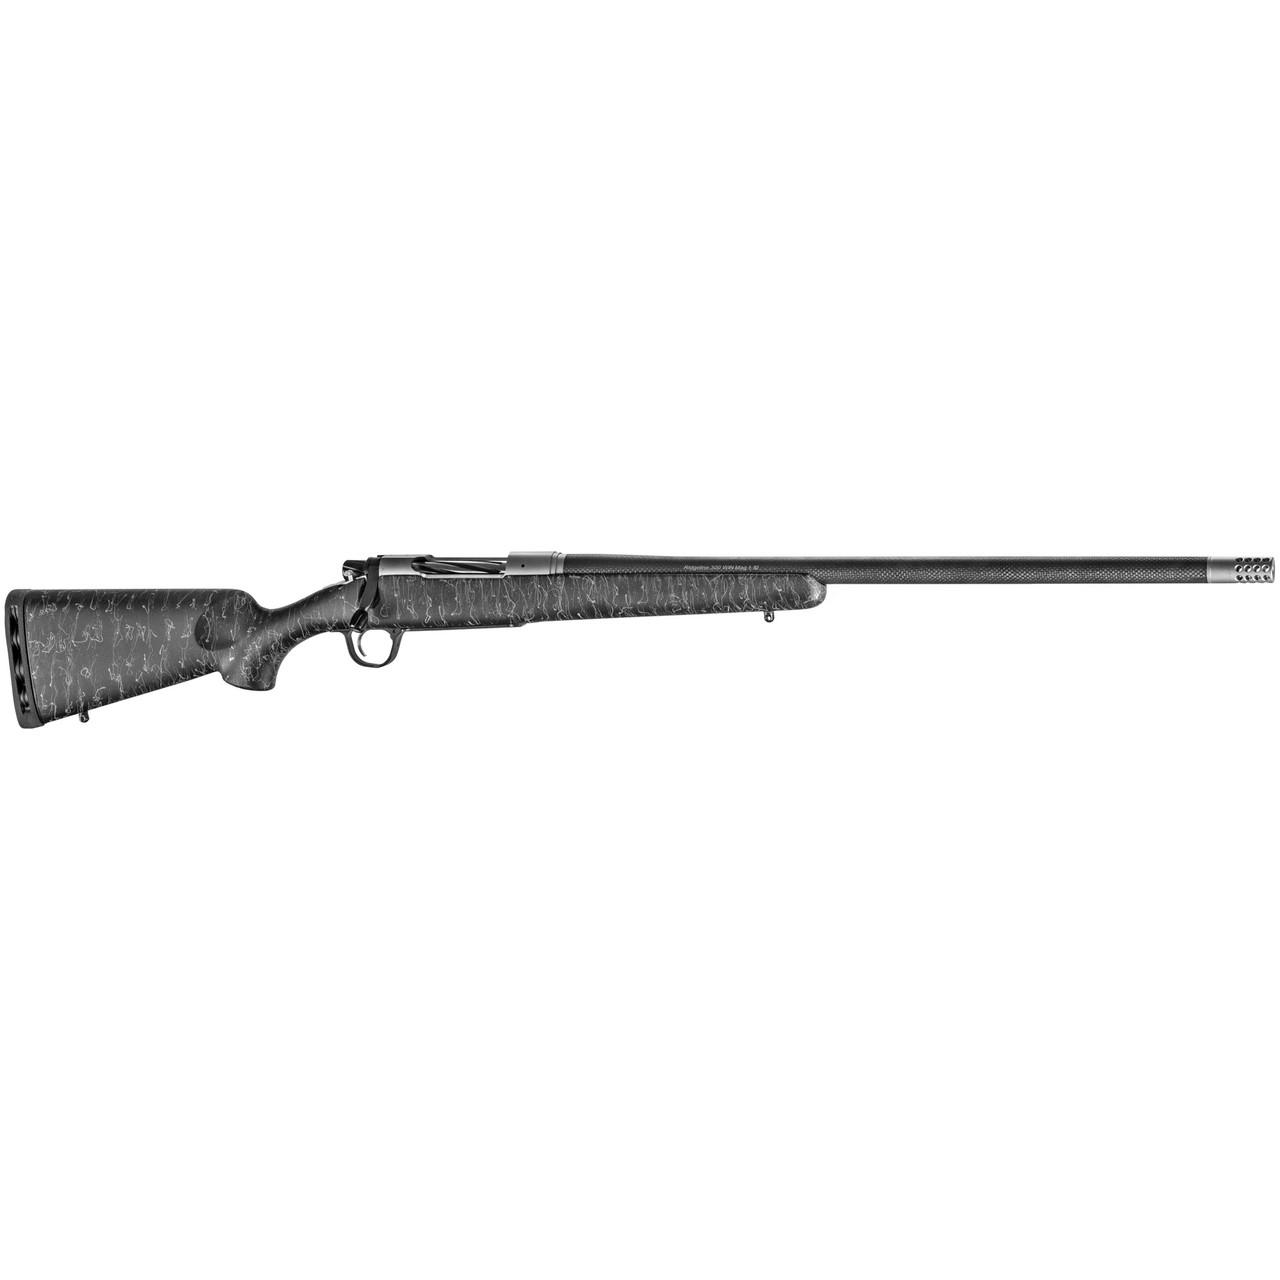 "Christensen Arms Ridgeline 24"" SS Action CALIFORNIA LEGAL - 6.5 Creedmoor - Black w/ Gray Webbing"